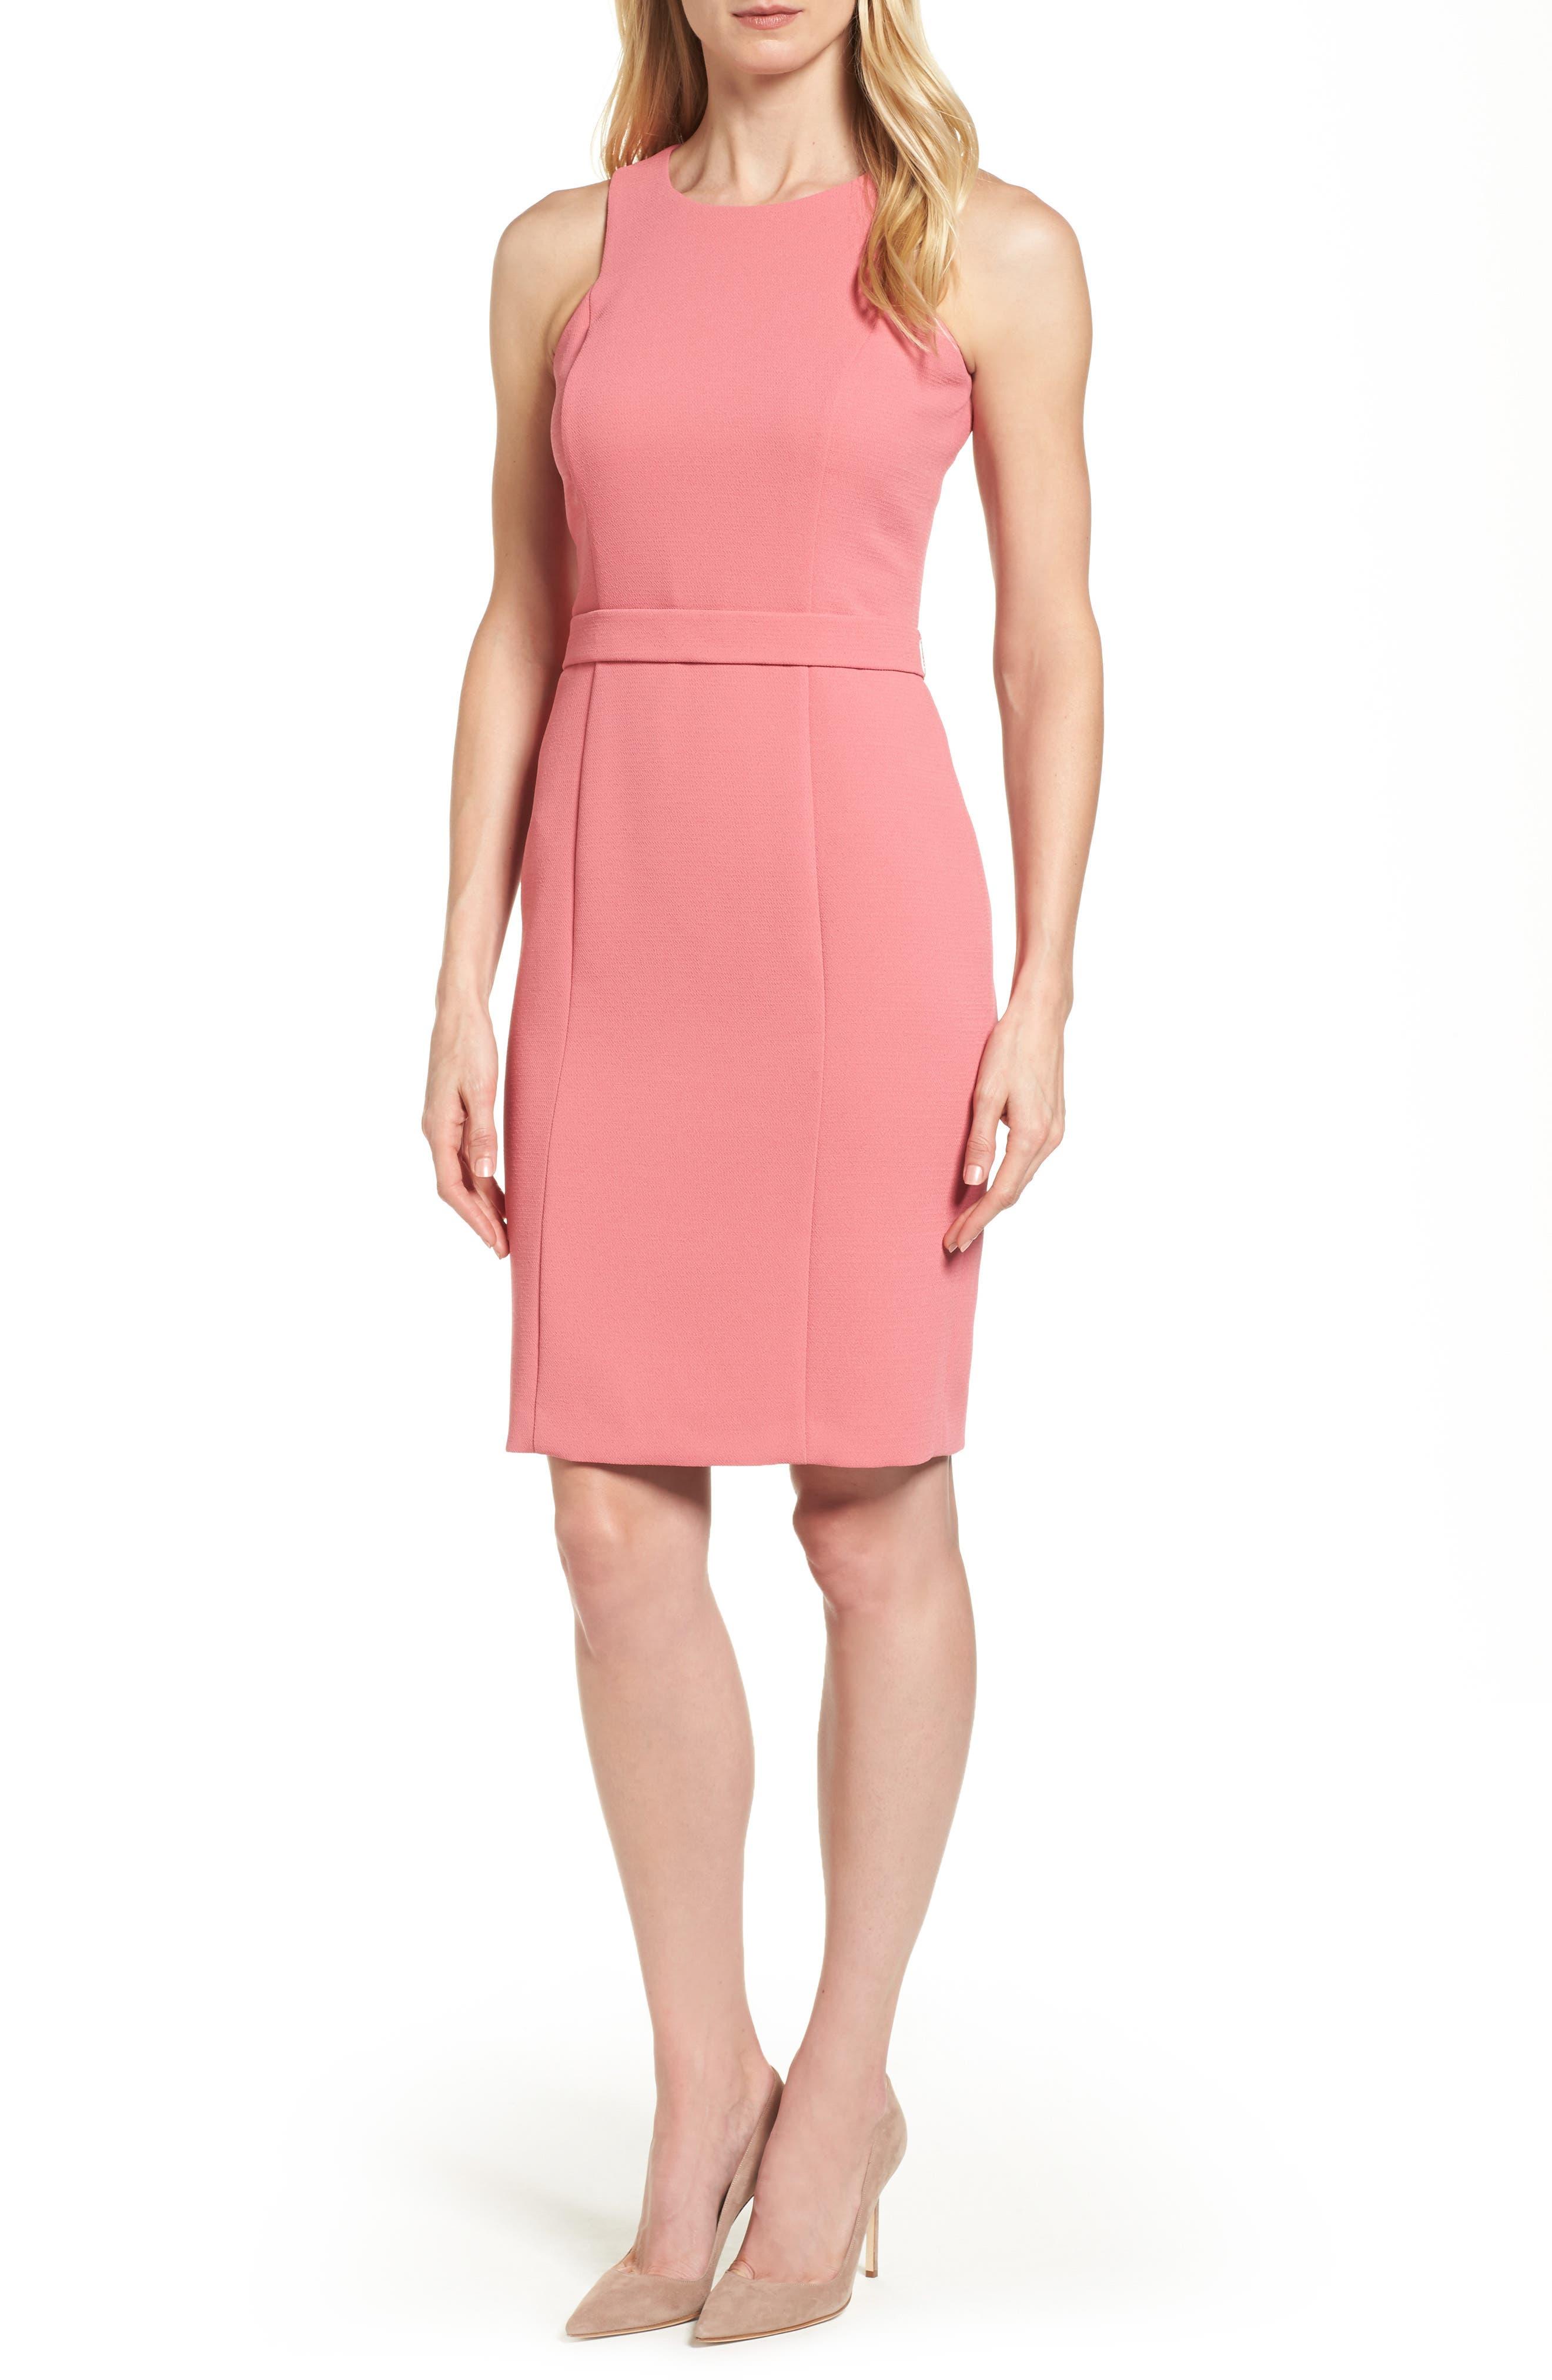 Dalanea Belted Sheath Dress,                             Main thumbnail 1, color,